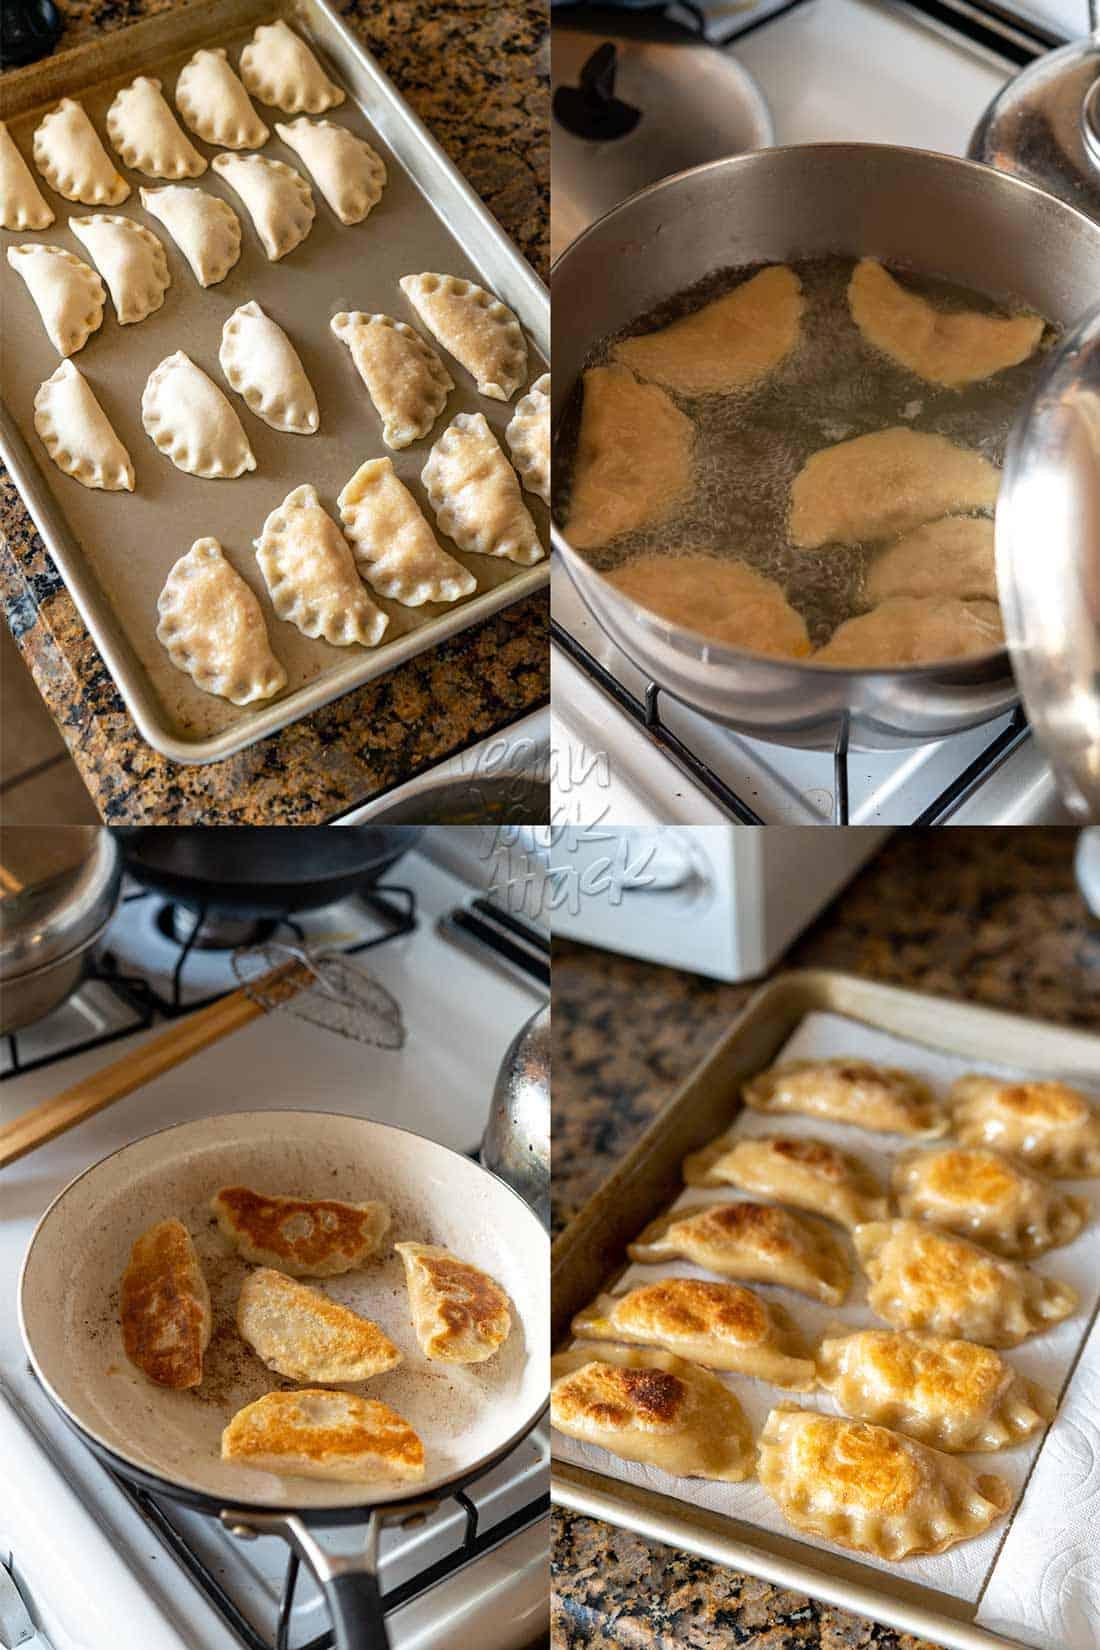 Image collage of boiling and frying potato pierogi